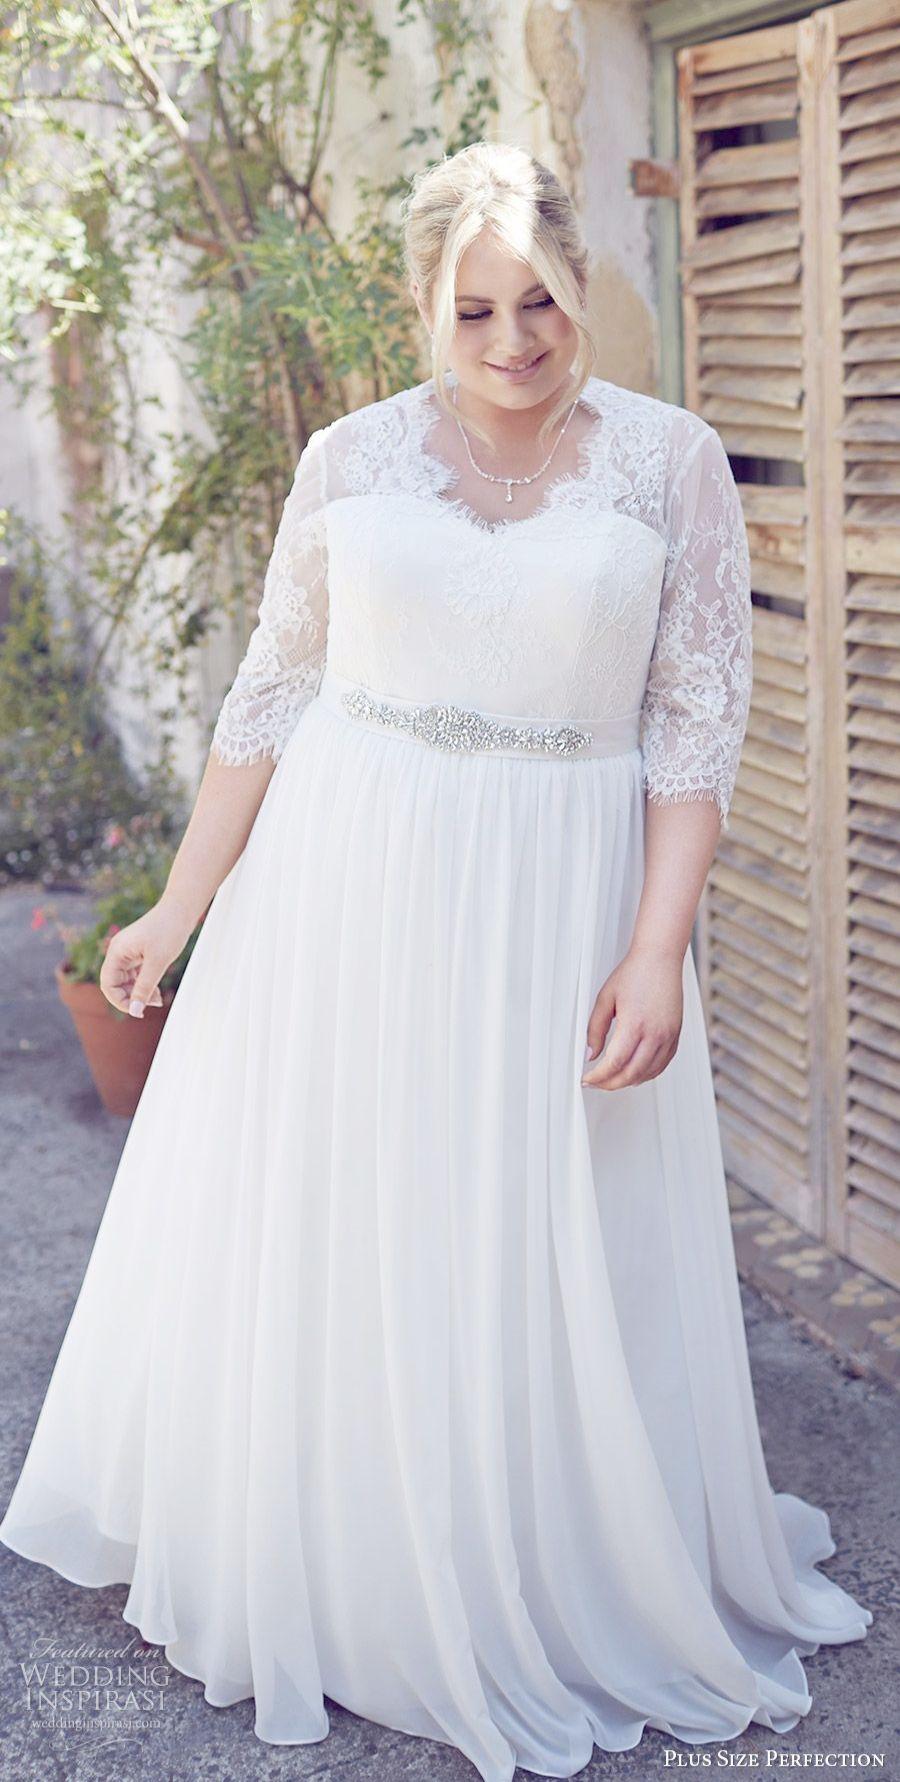 Lace Wedding Dresses Older Bride Lace Wedding Dresses ...